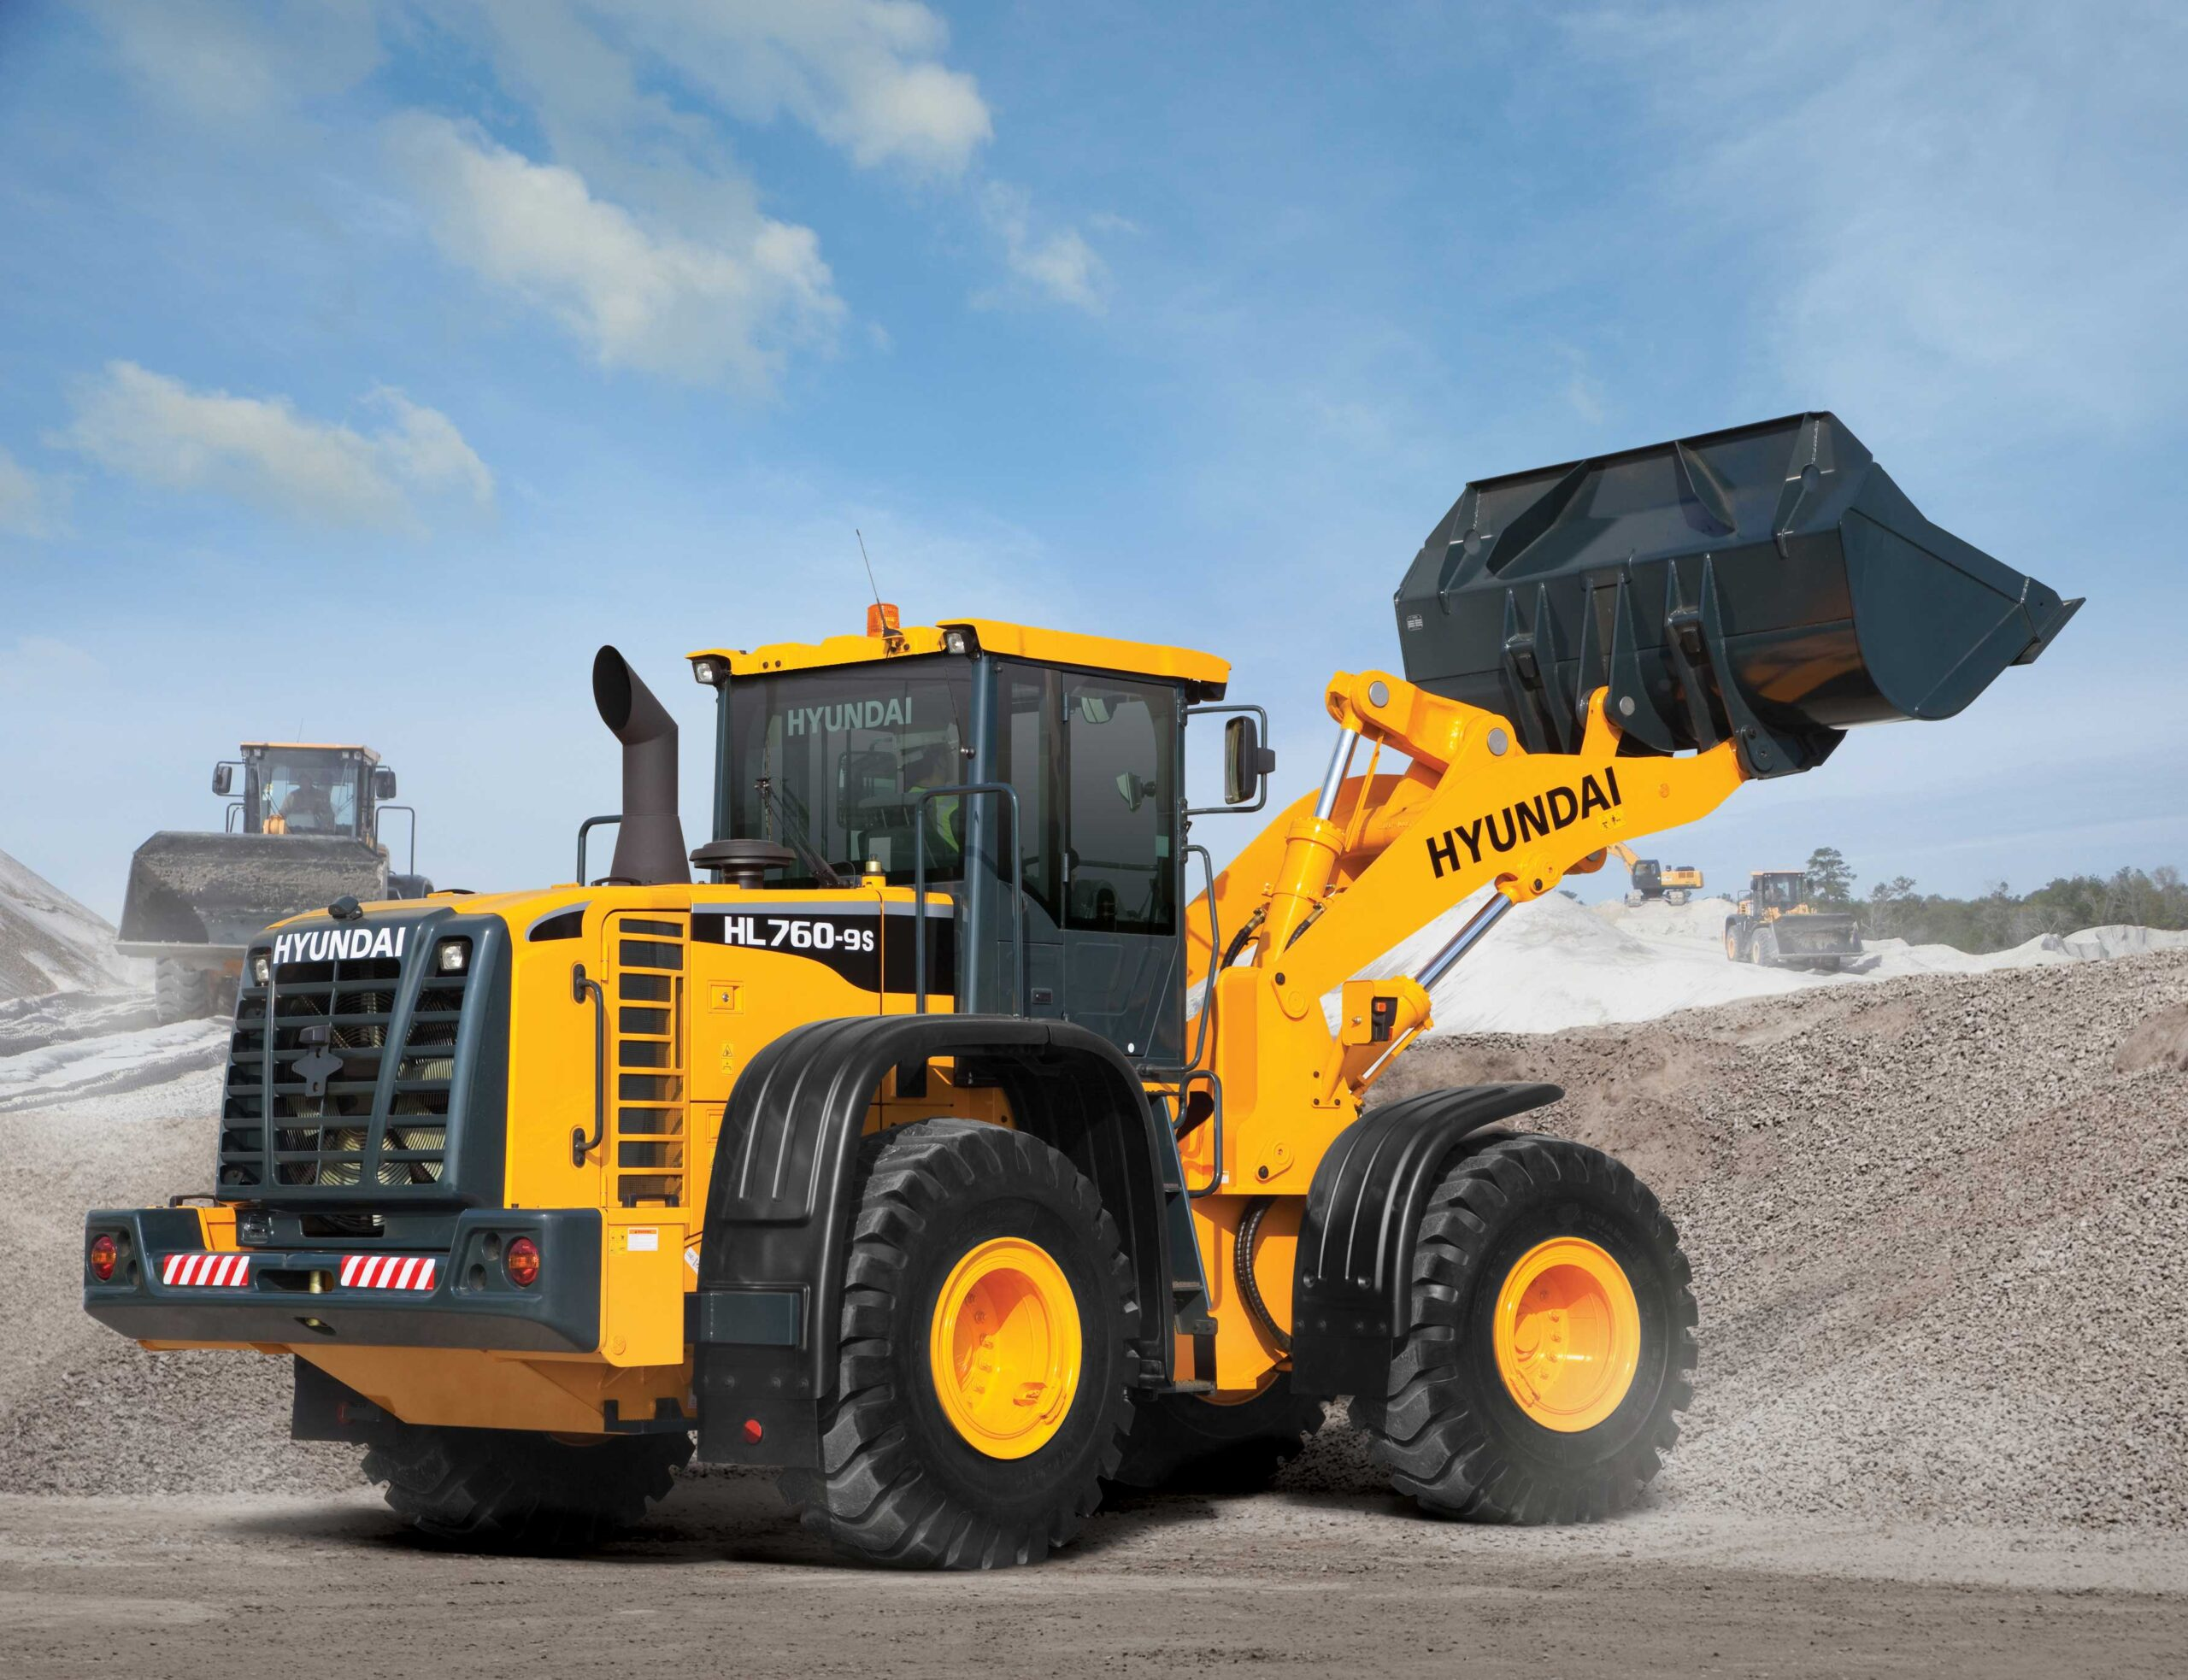 2020-hyundai-hl760-9s-equipment-cover-image